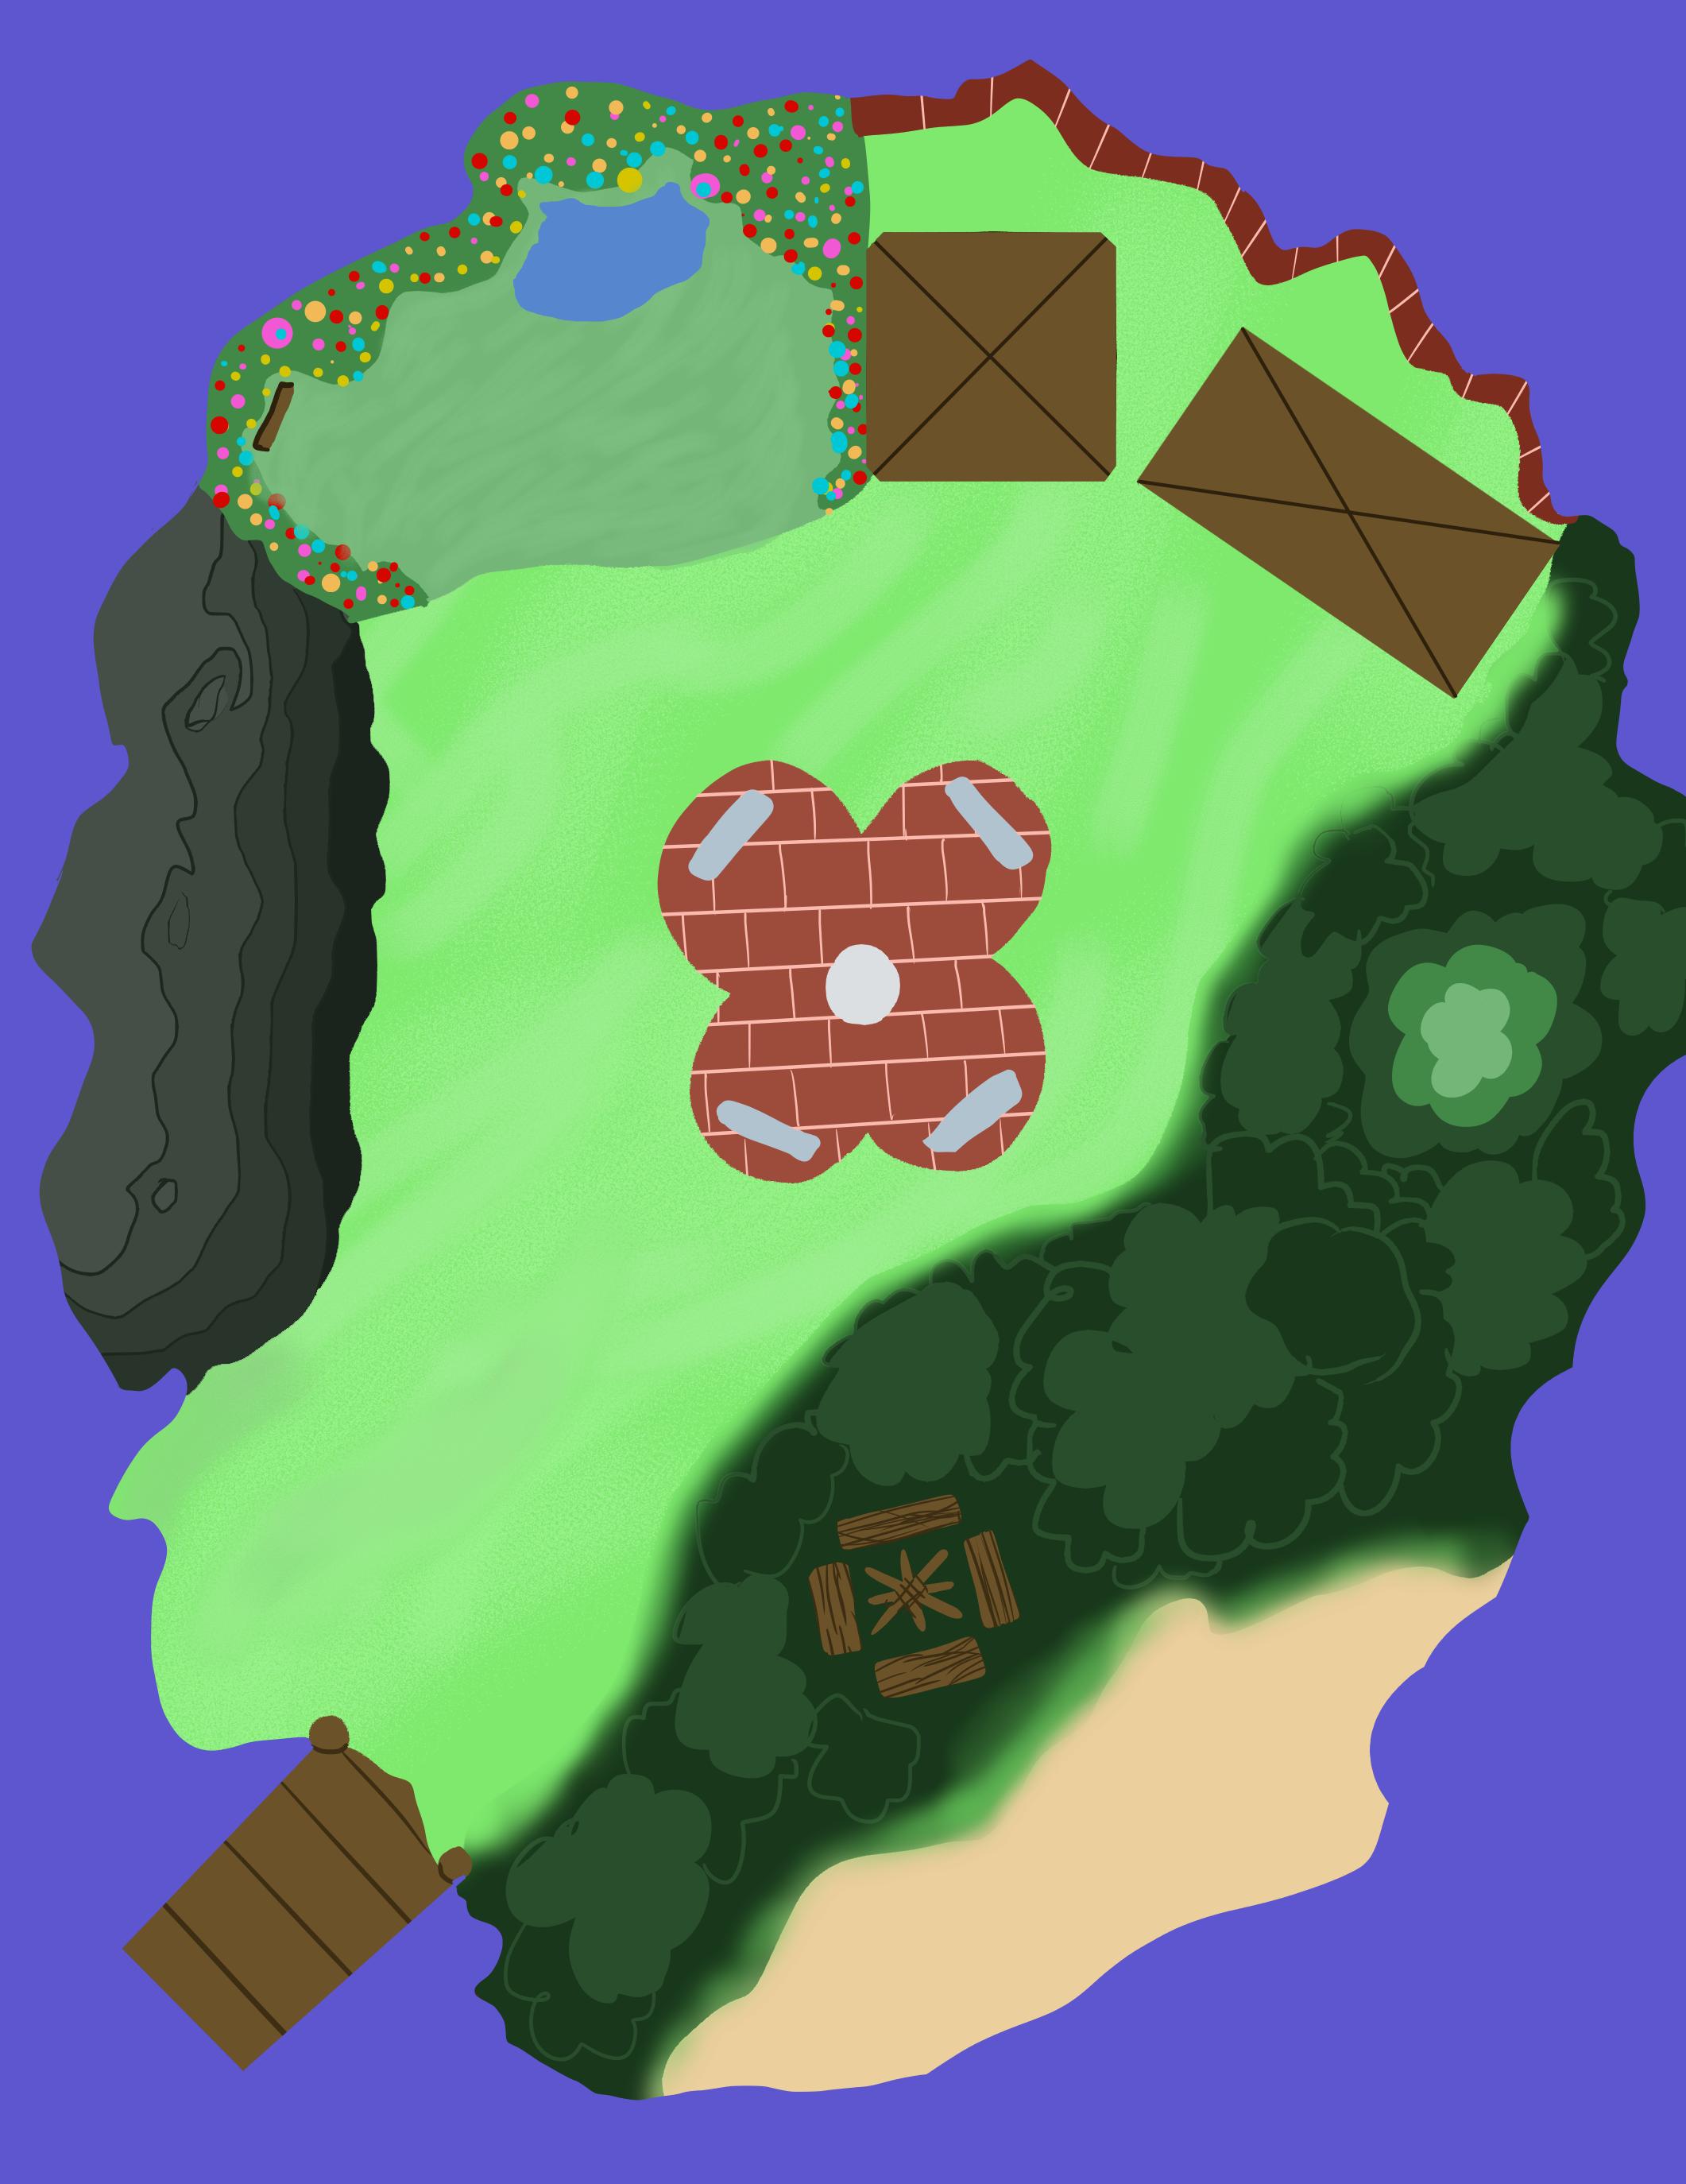 mapss.png